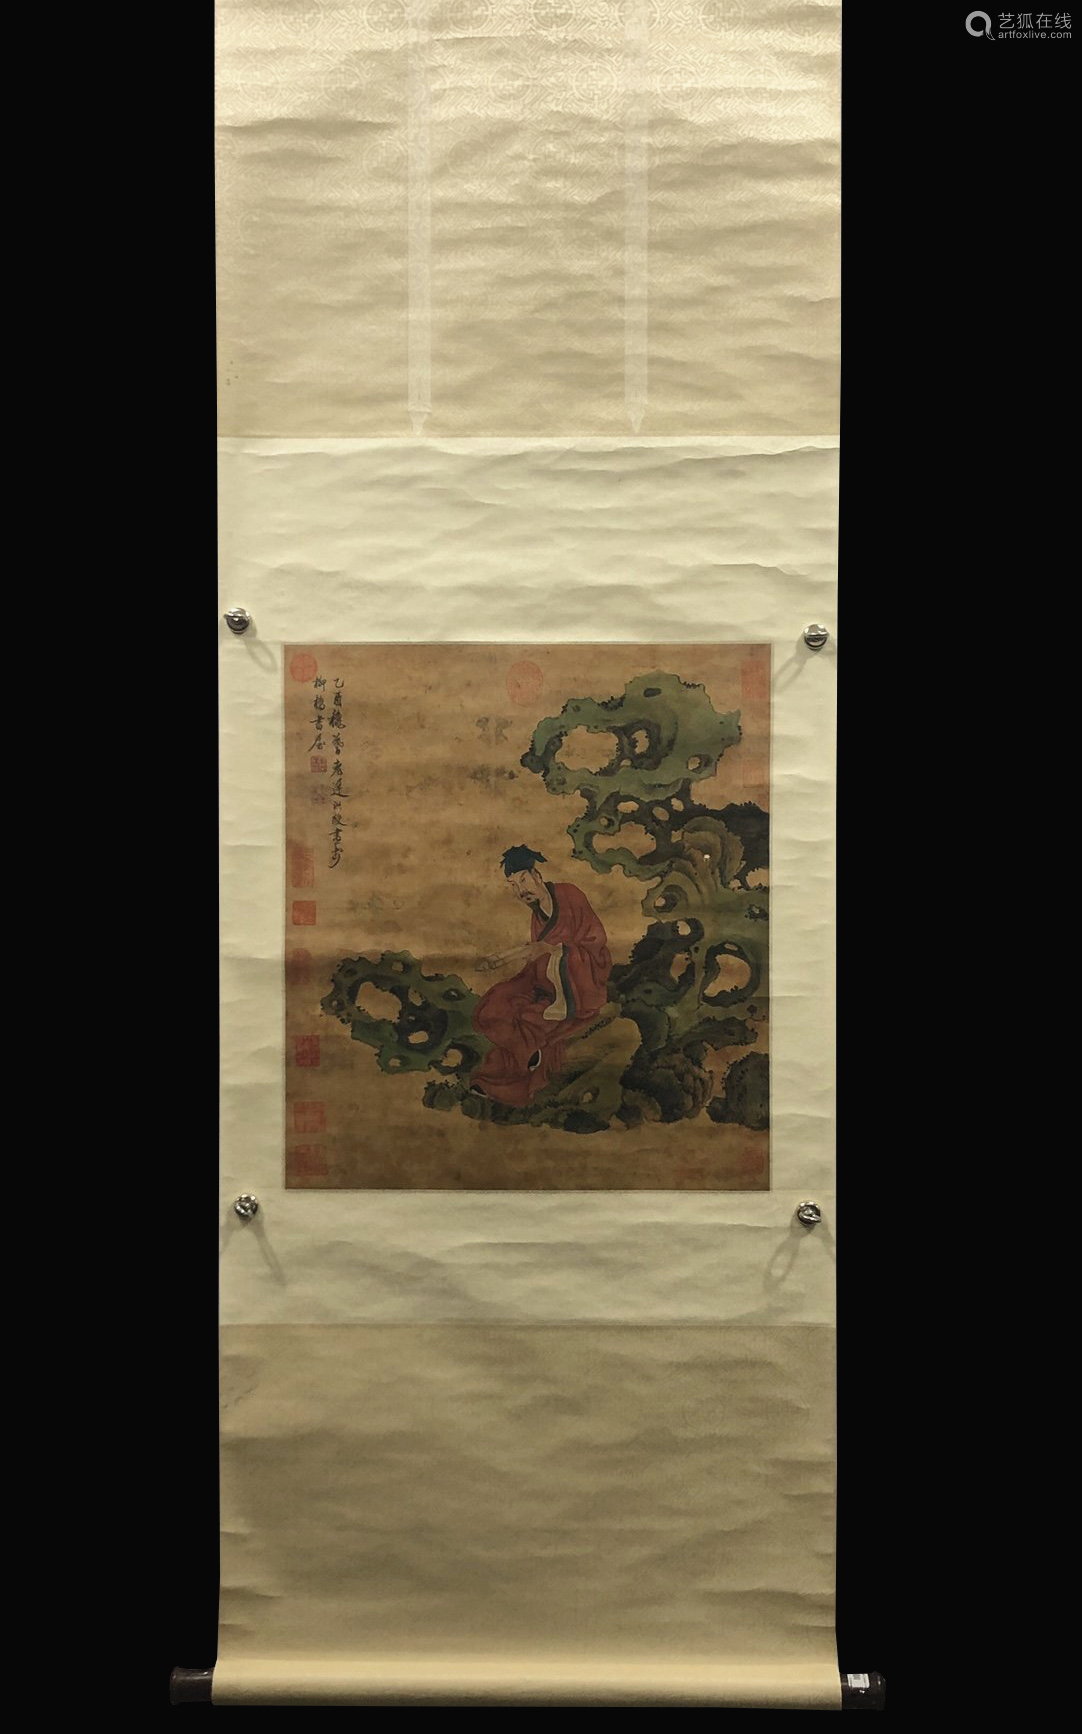 A Chen hongshou's figure painting